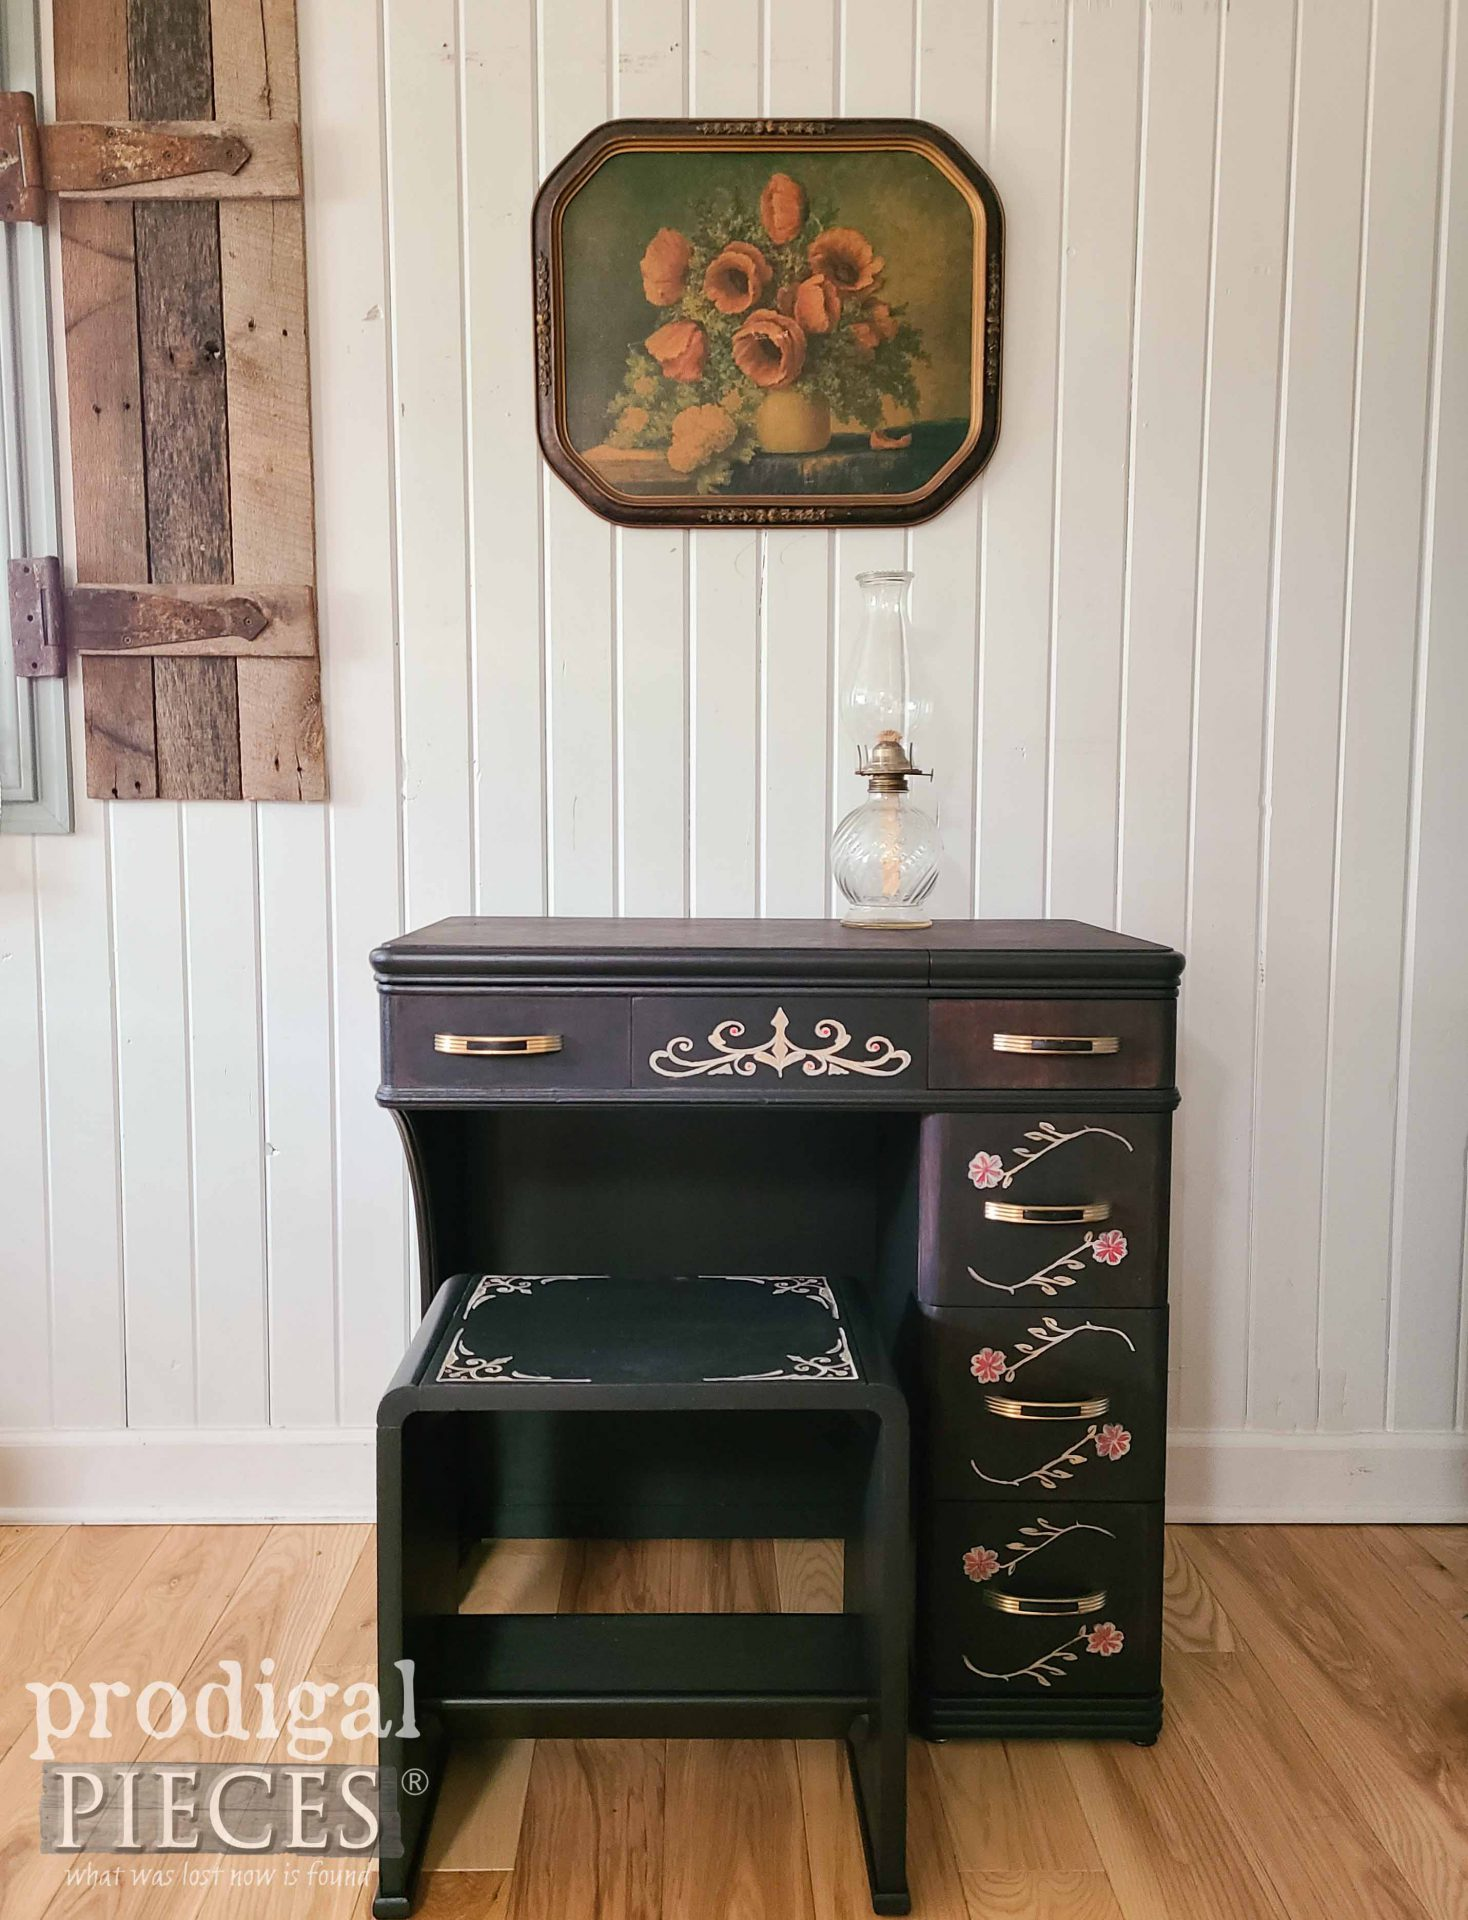 Antique Art Deco Sewing Desk Makeover by Larissa of Prodigal Pieces | prodigalpieces.com #prodigalpieces #antique #sewing #furniture #home